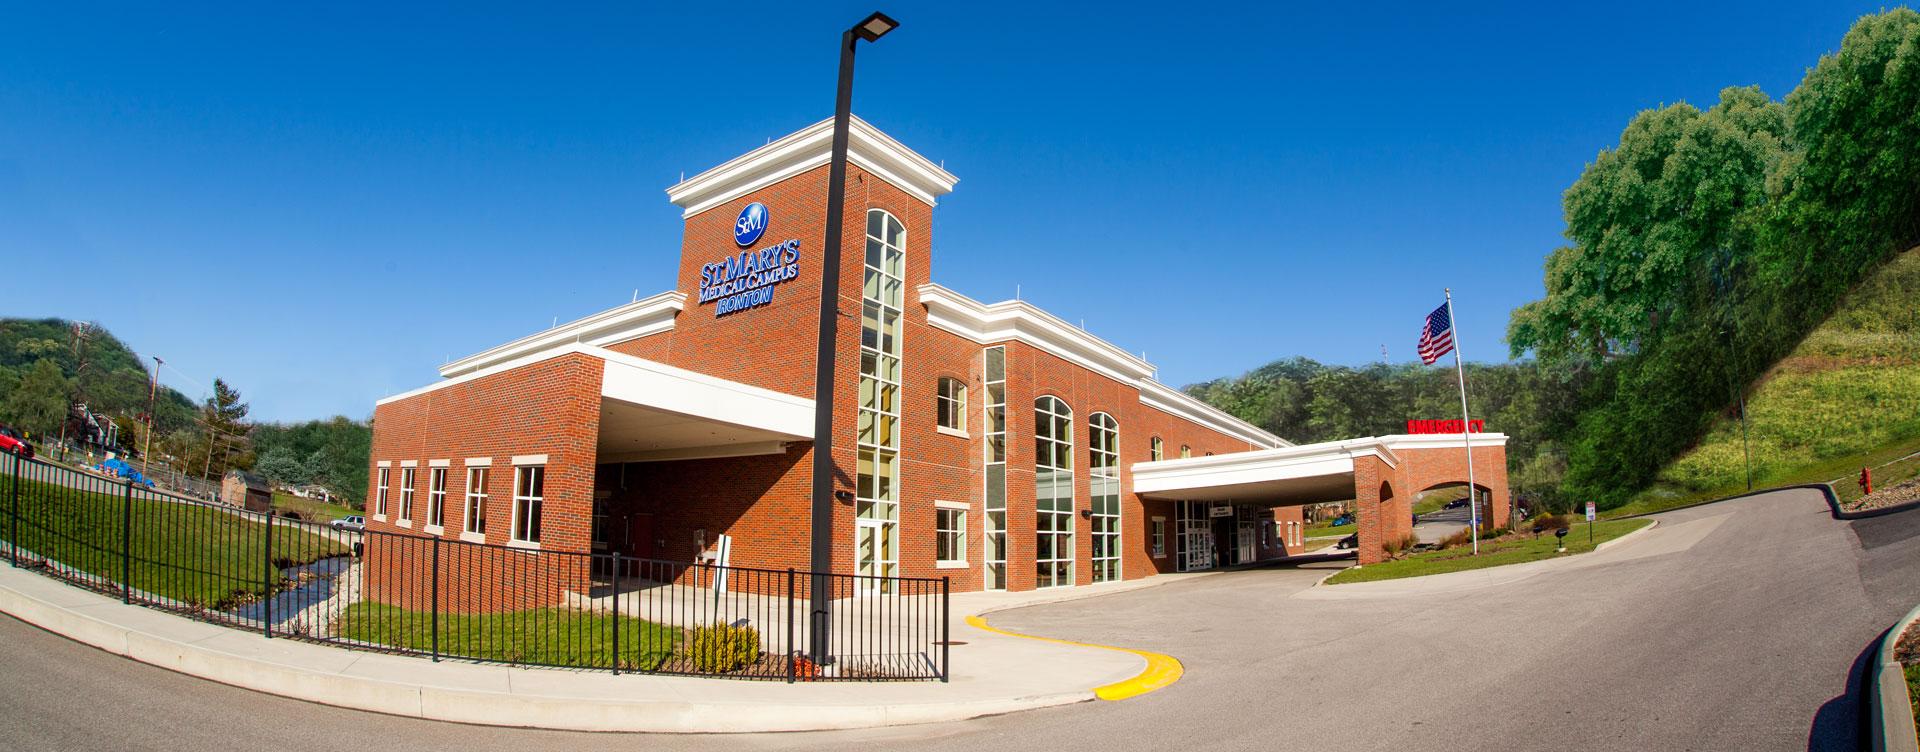 Ironton Family Medical Center photo